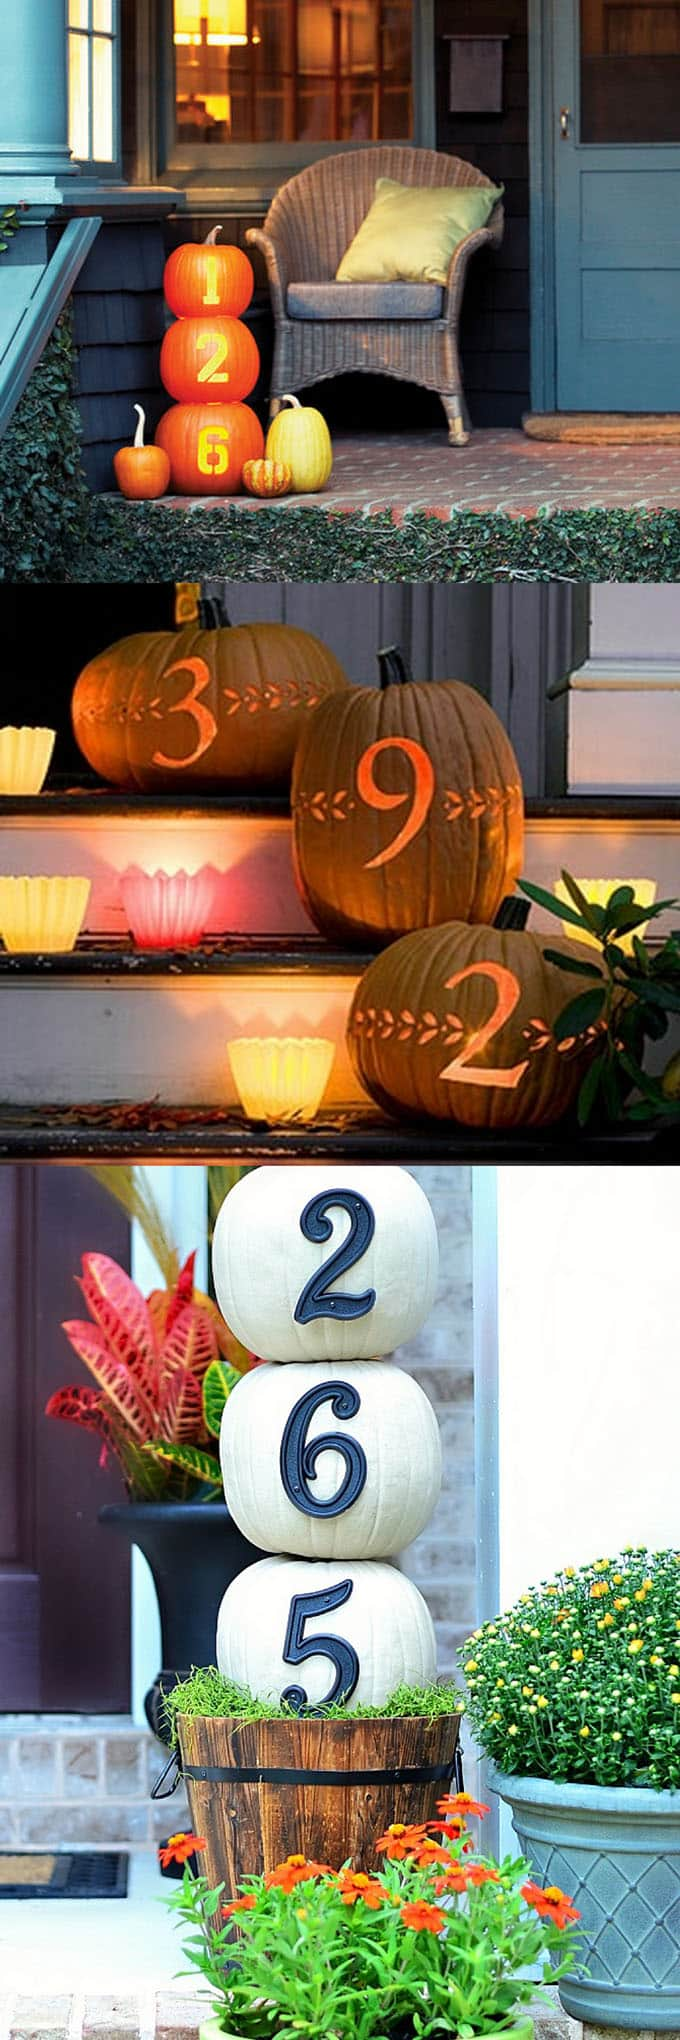 25-front-door-fall-decorations-apieceofrainbow (11)